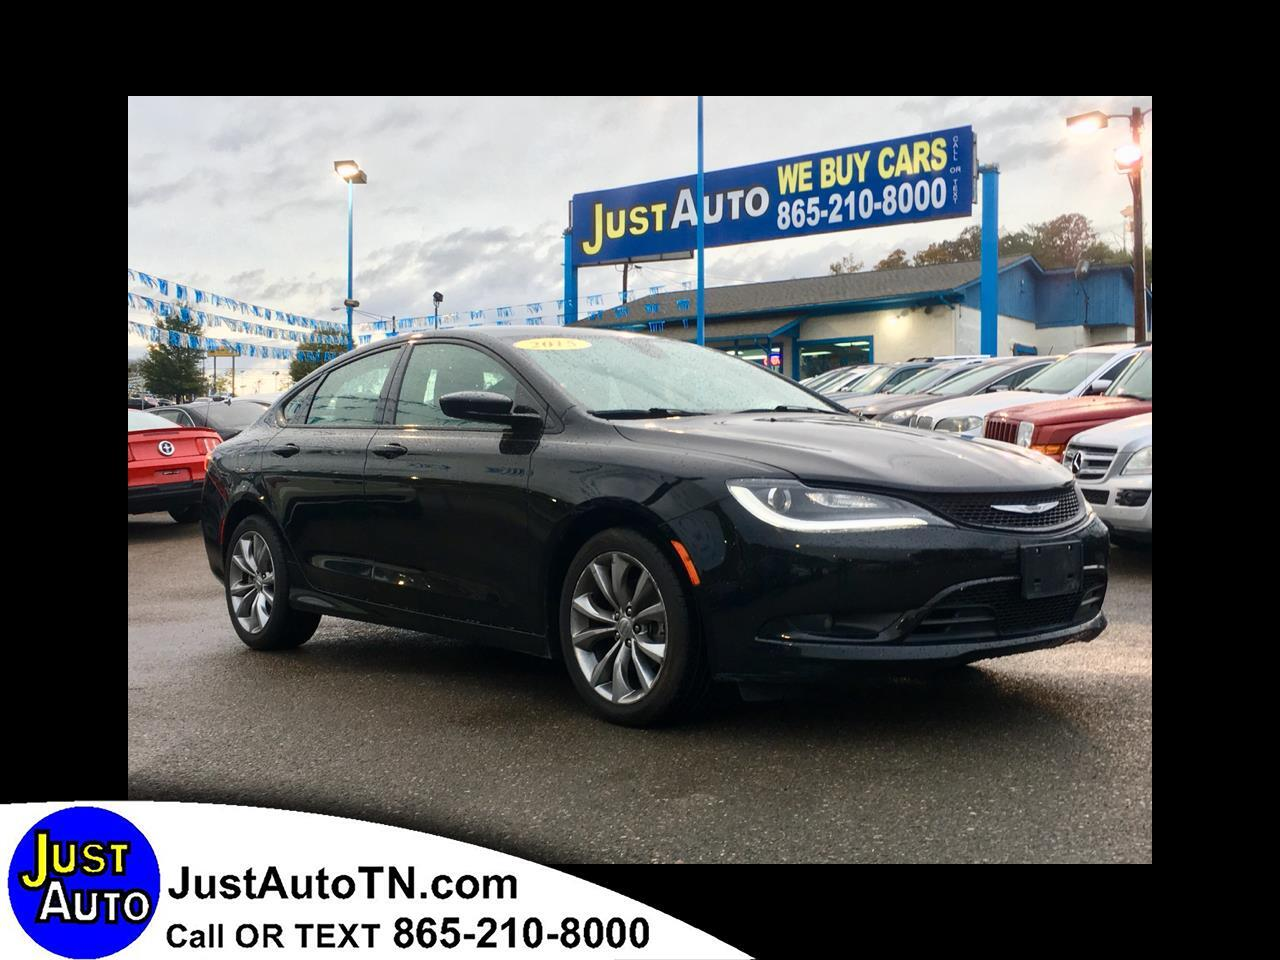 2015 Chrysler 200 4dr Sdn LX